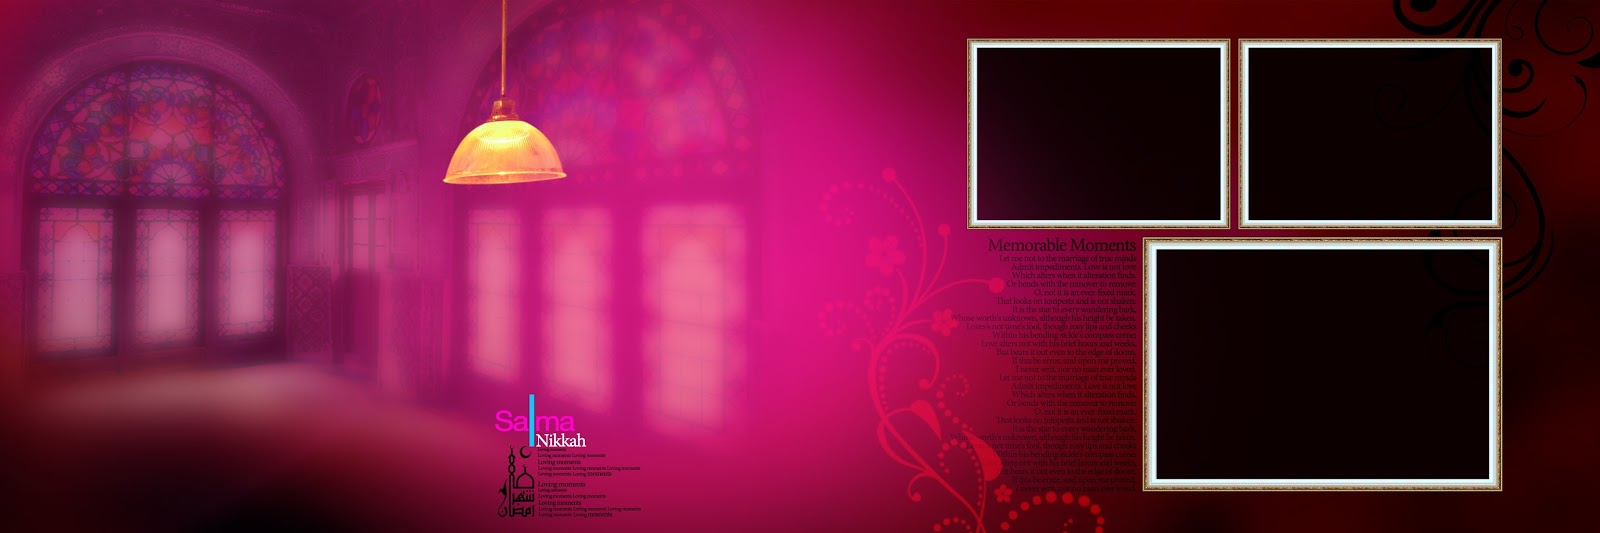 Karishma Wedding Album Design In Photoshop Psd Free Downloads Naveengfx